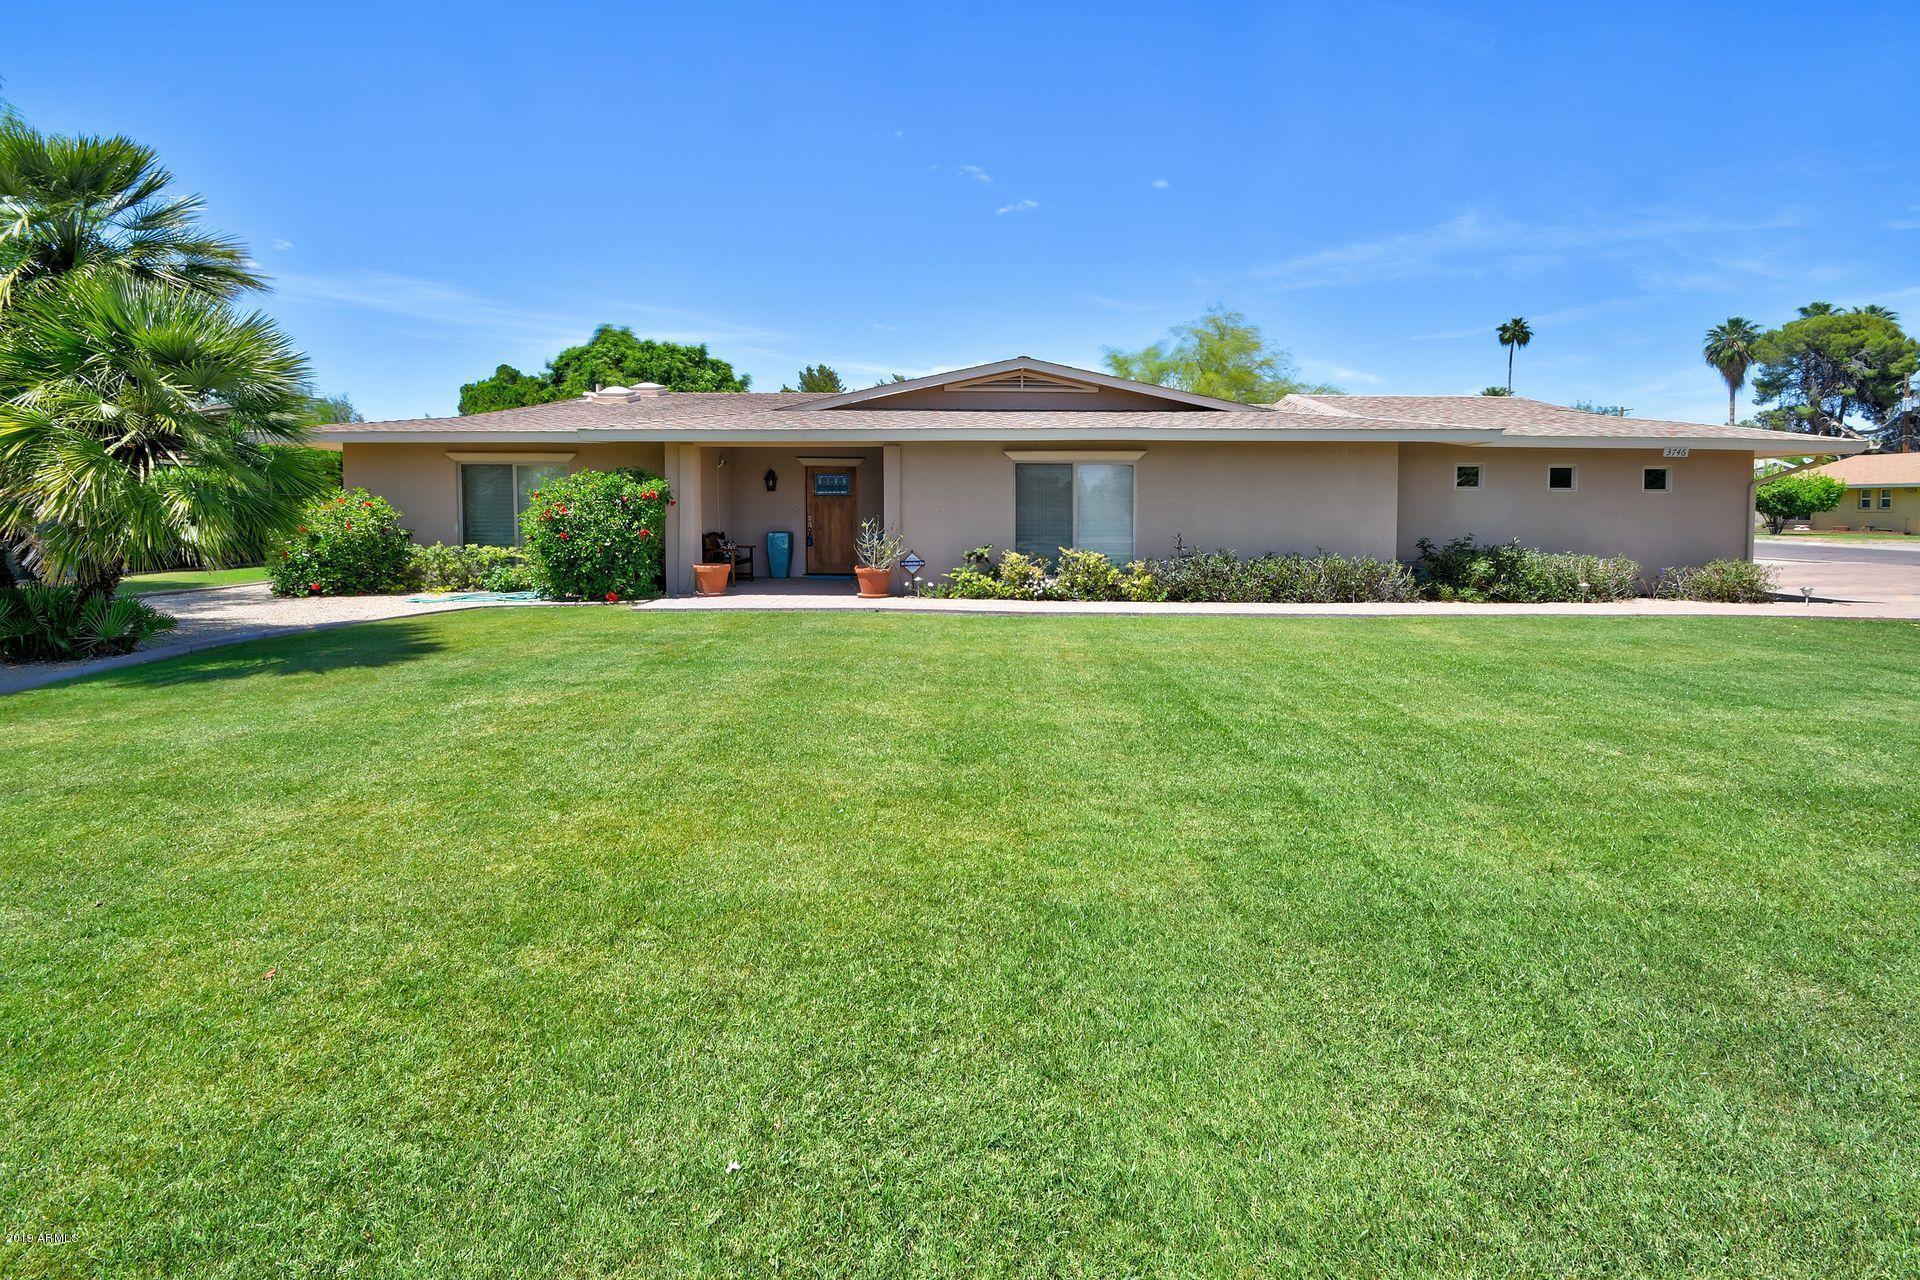 Photo of 3746 E CAMPBELL Avenue, Phoenix, AZ 85018